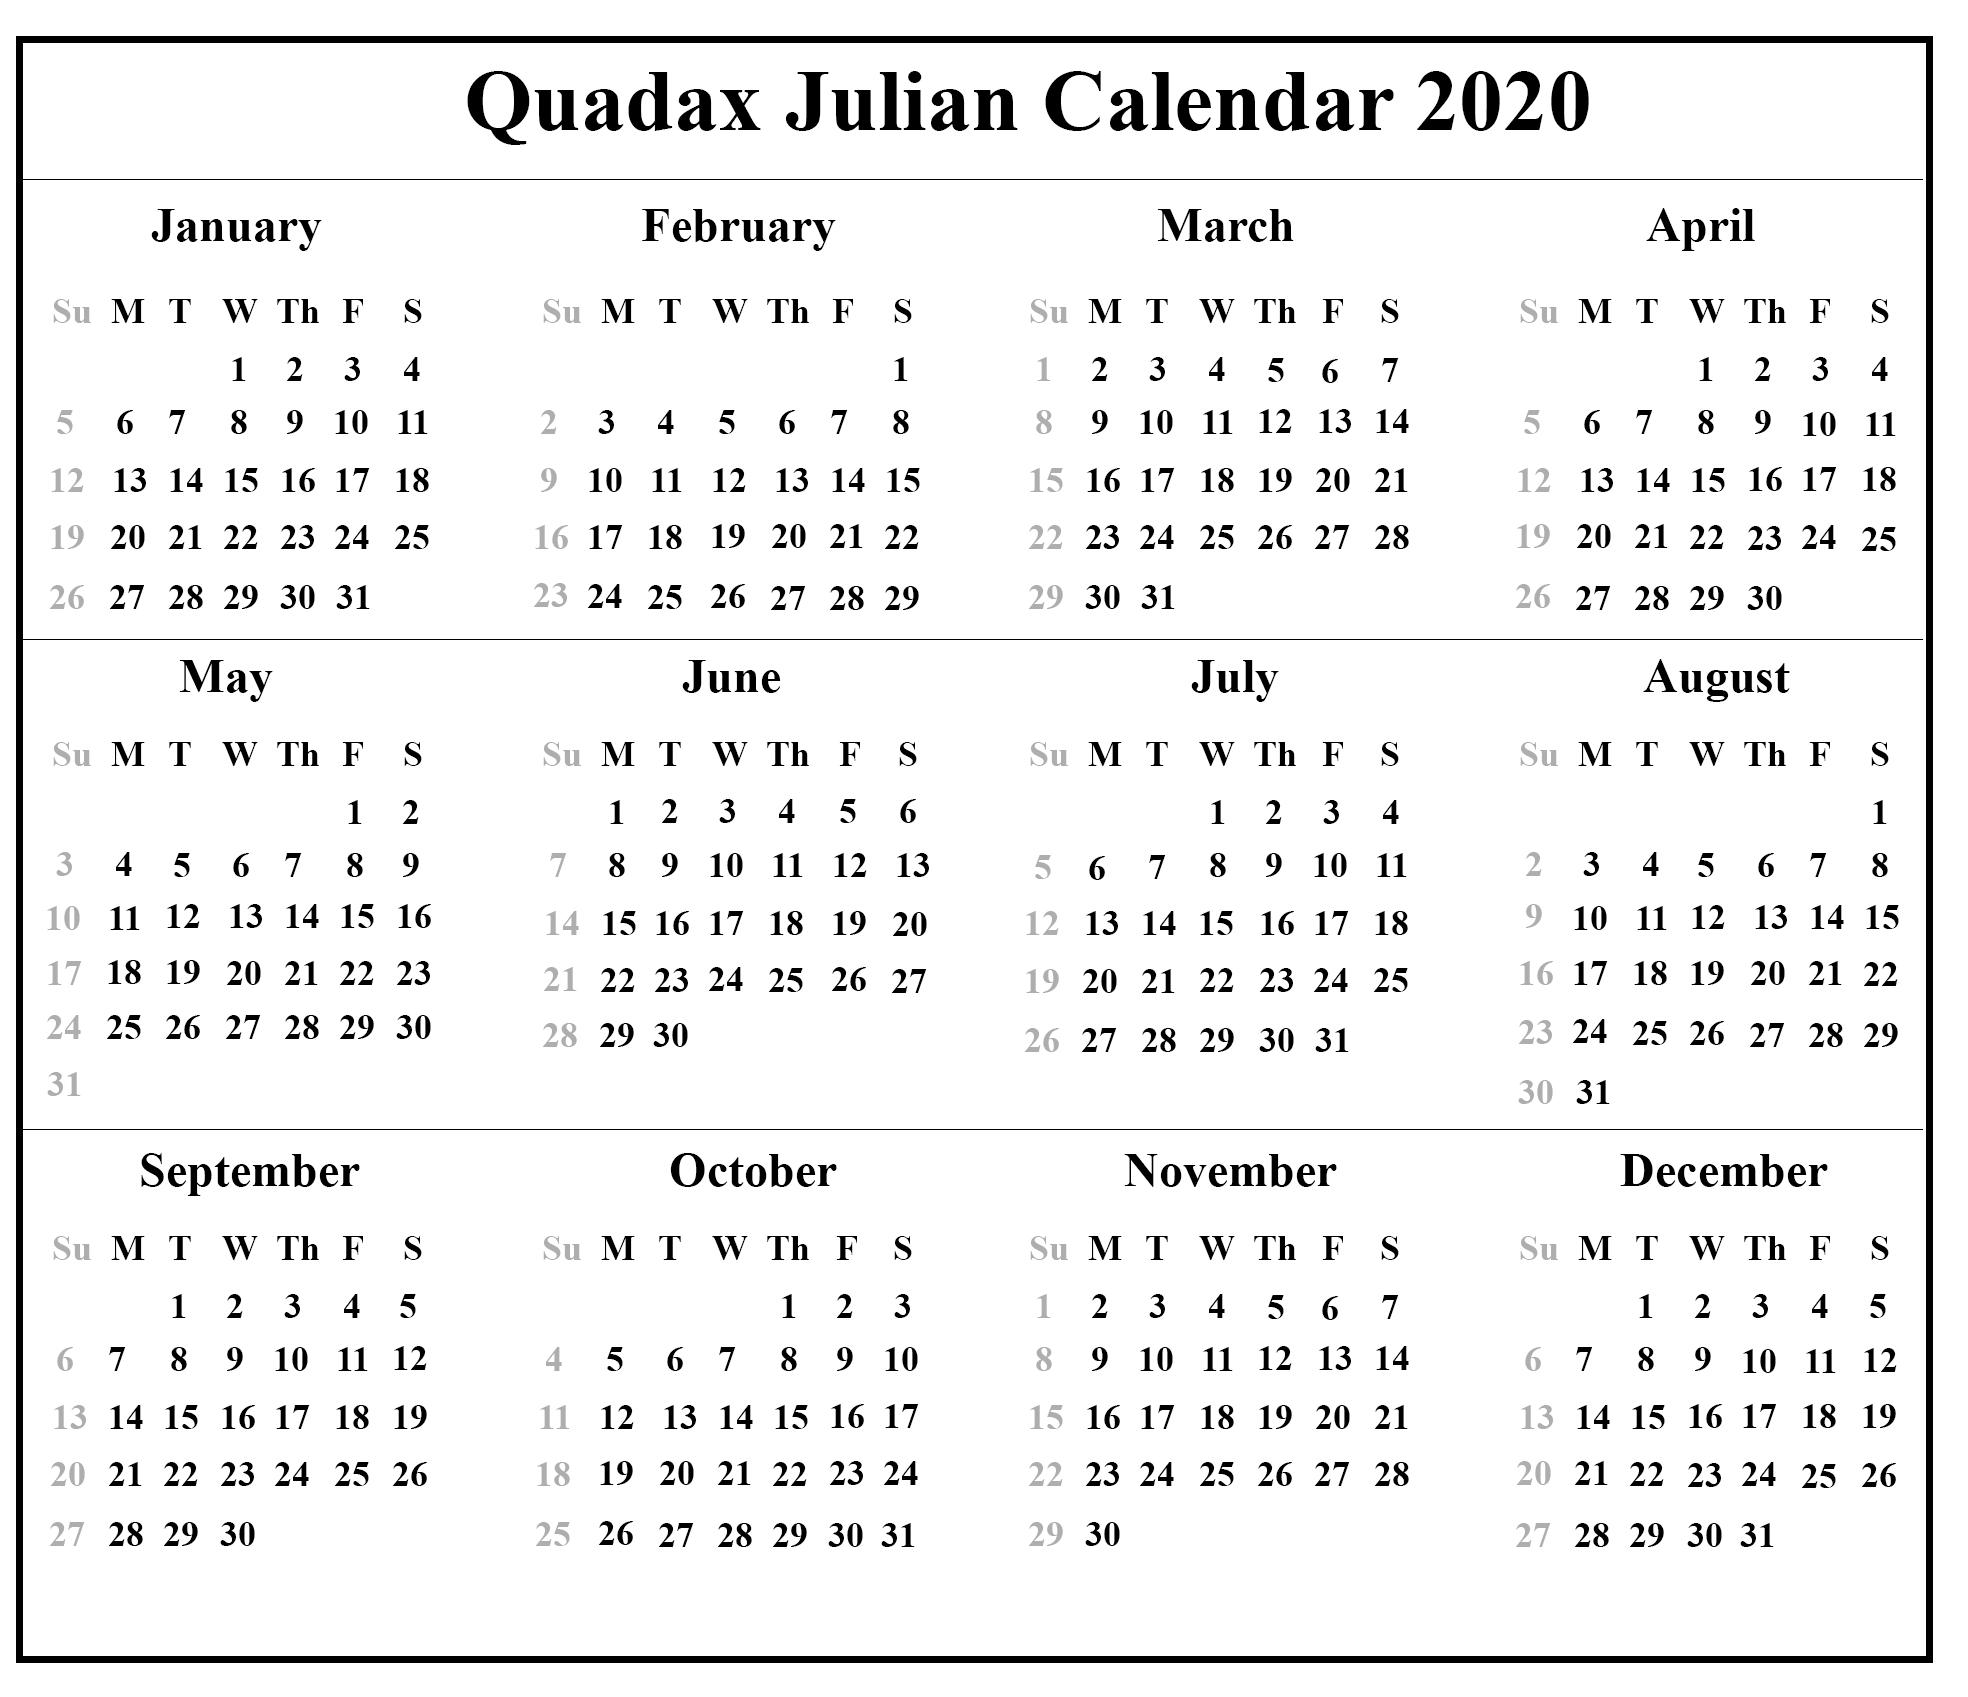 Julian Calendar 2020 Pdf Quadax | Example Calendar Printable regarding Quadax Julian Calendar